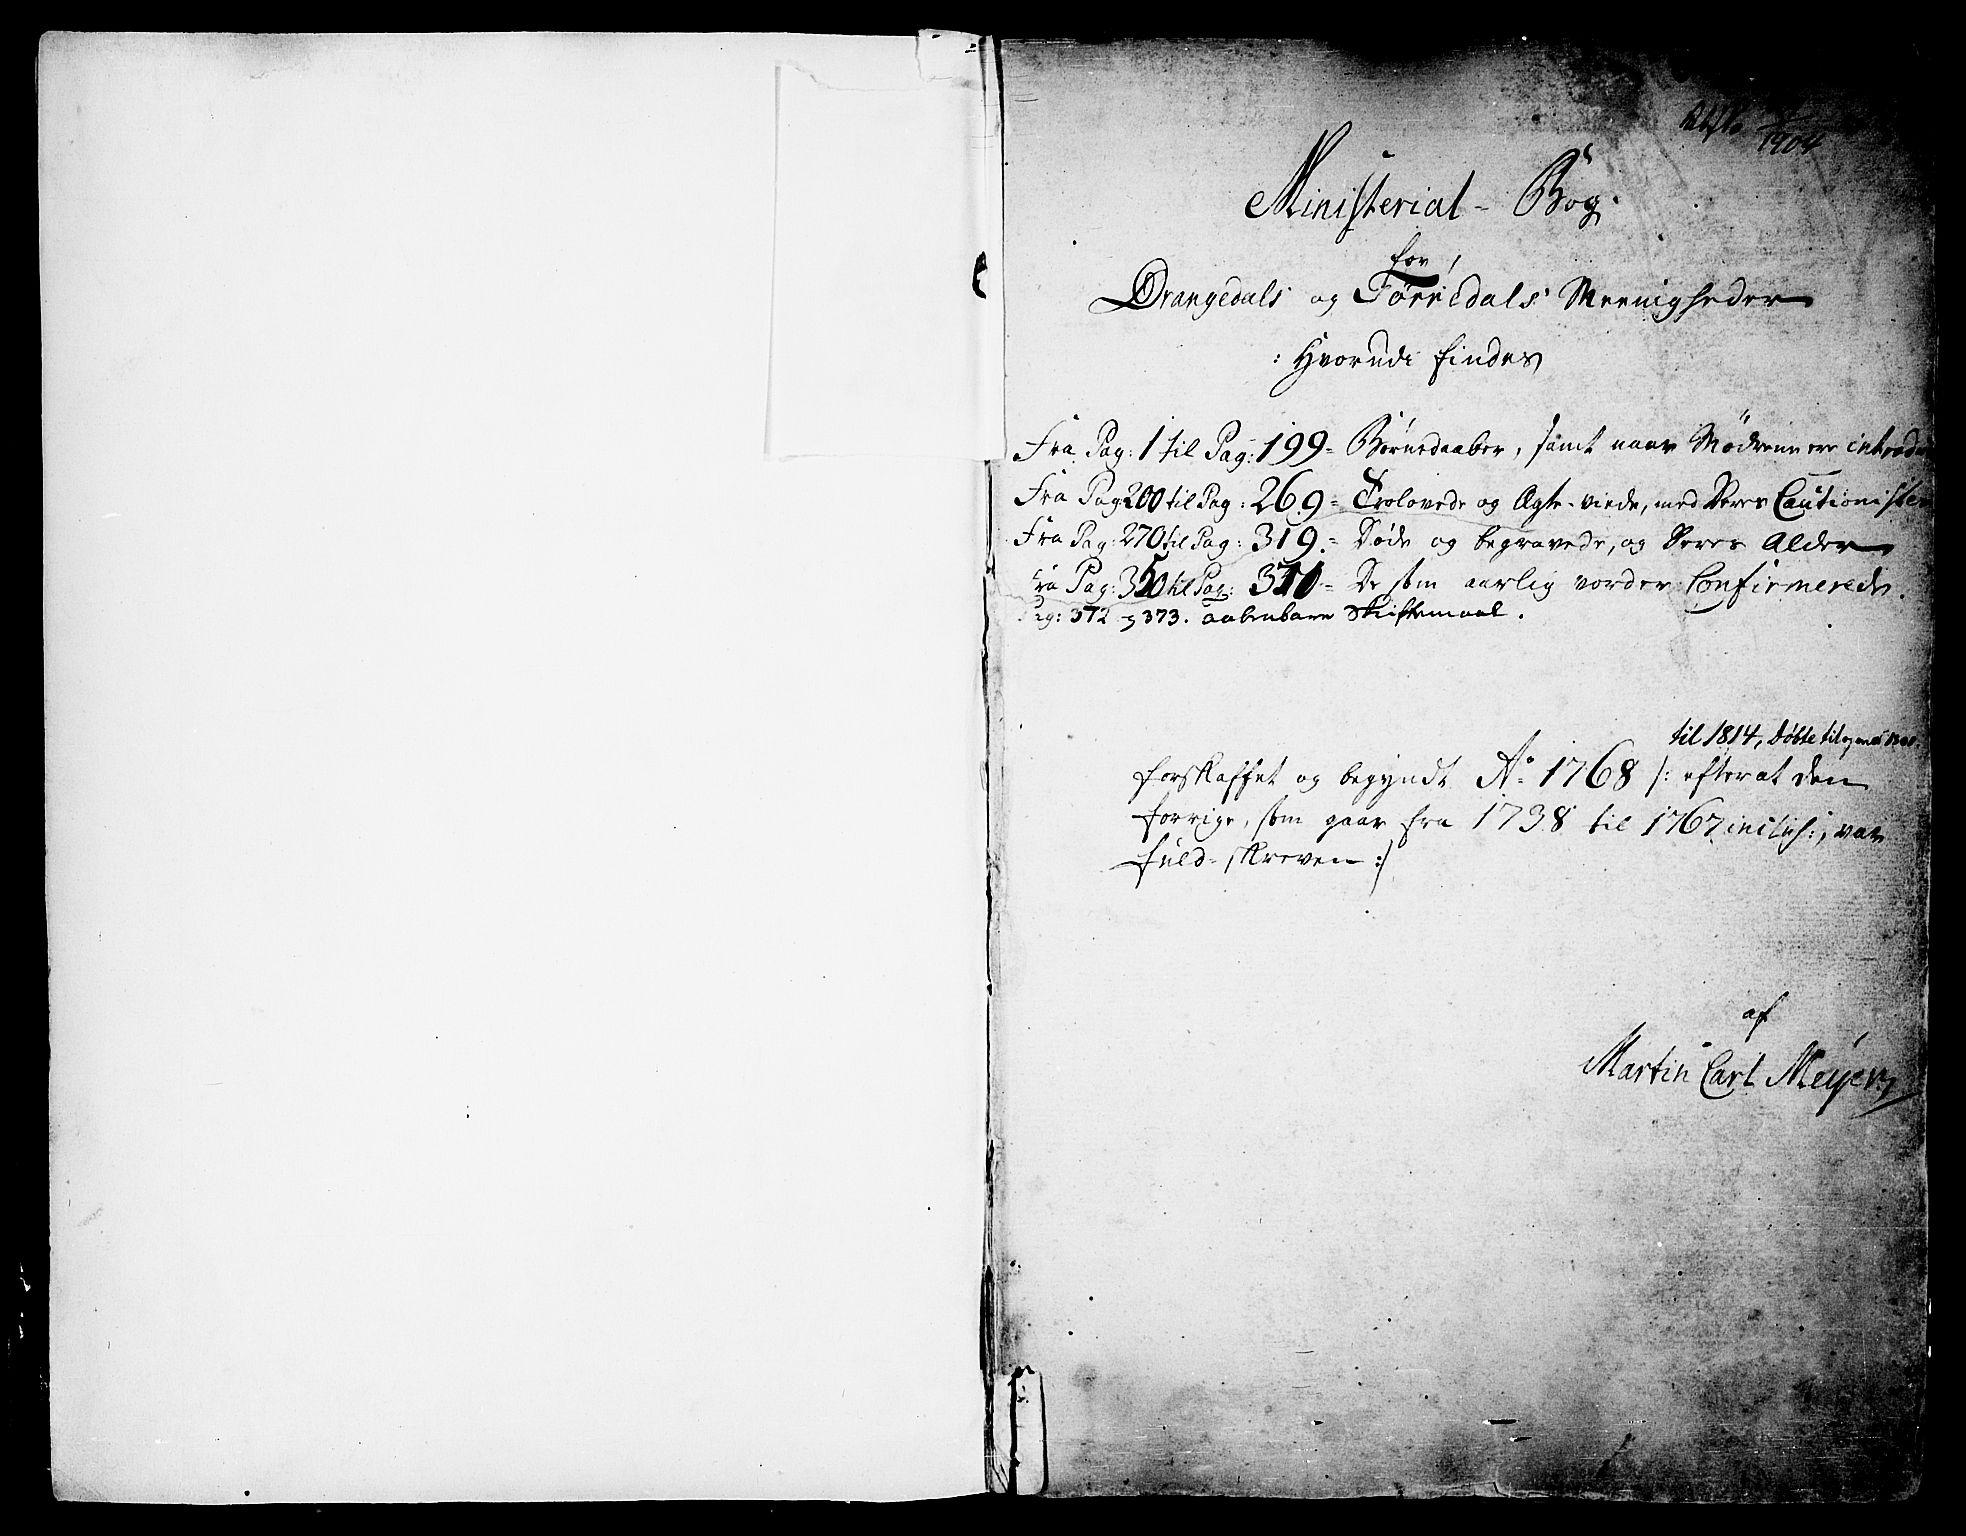 SAKO, Drangedal kirkebøker, F/Fa/L0003: Ministerialbok nr. 3, 1768-1814